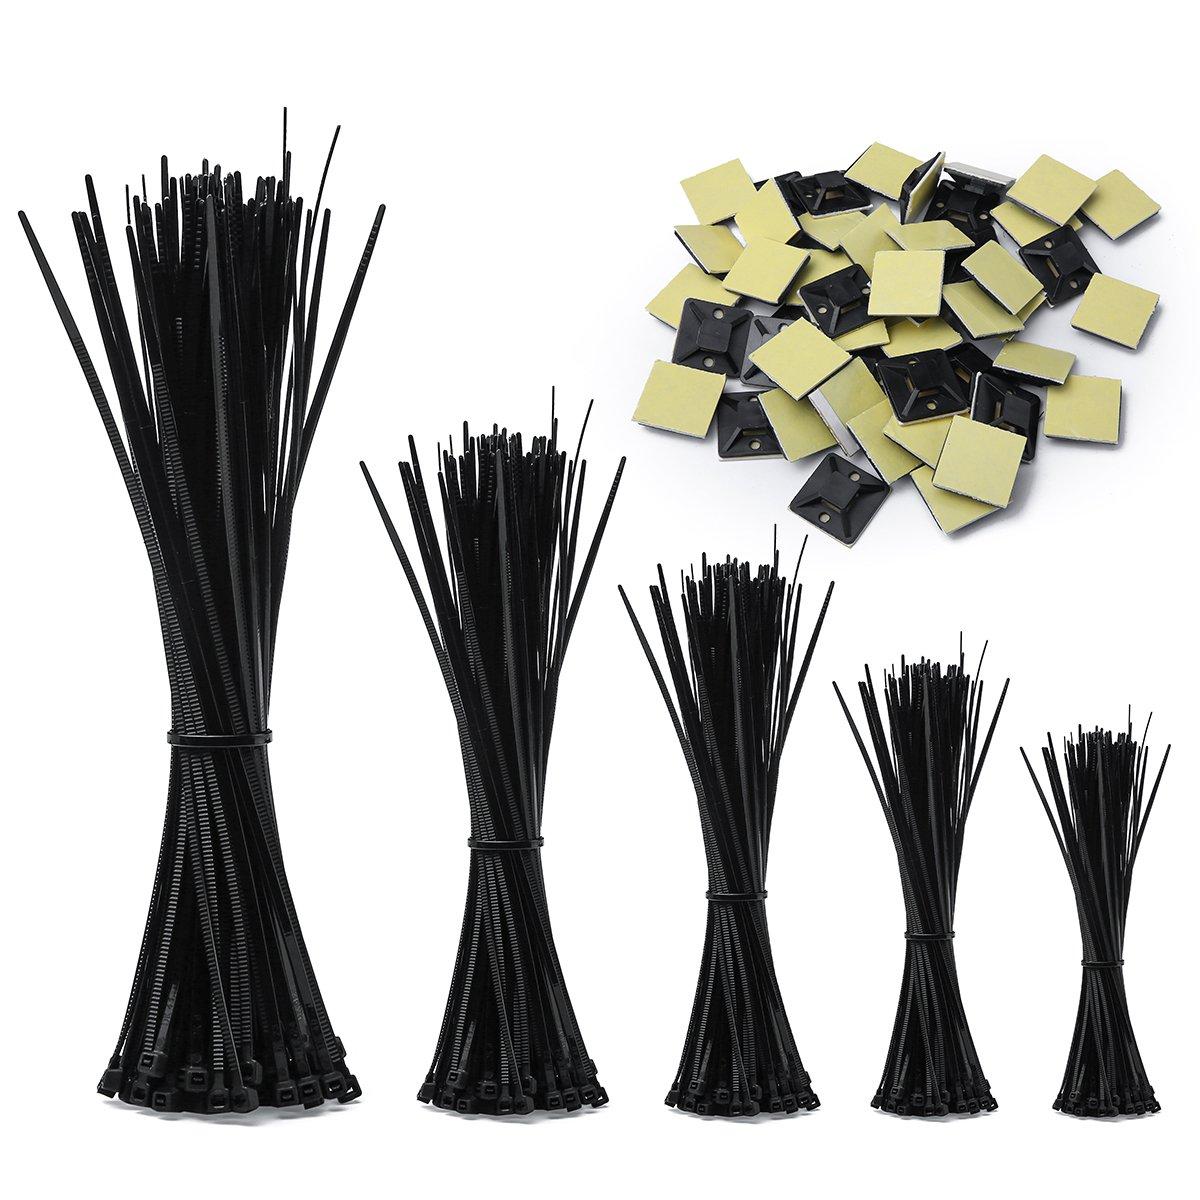 kabelbinder, UV Bestä ndig 500 Stck 100/140/160/200/300 mm zip ties(Und 50 Kabelbinderhalter) schwarz SUNUGGE